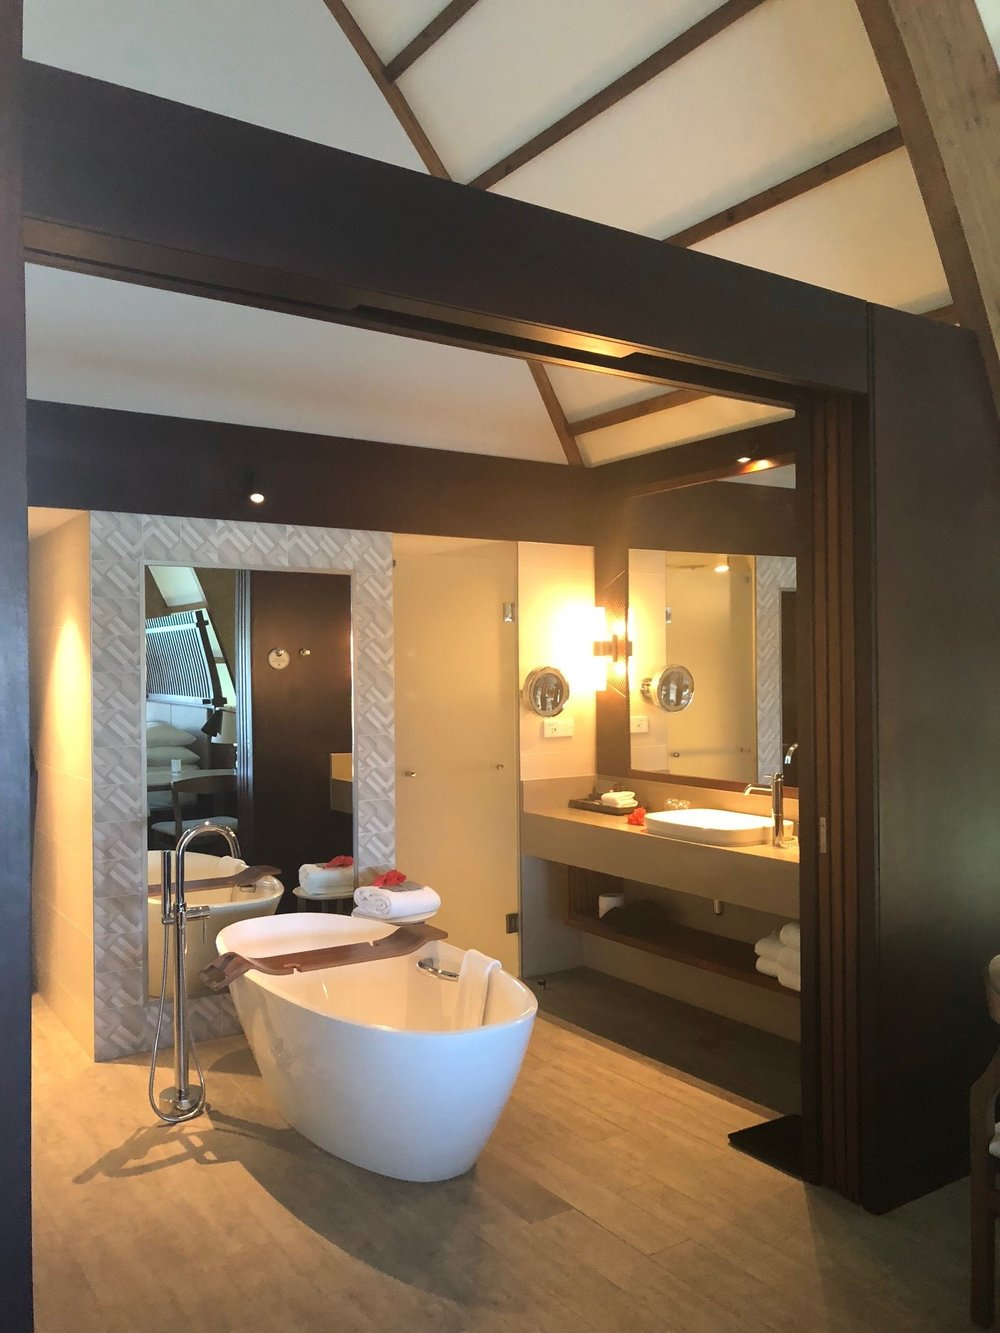 Fabulous Fiji! — House of Travel Otago